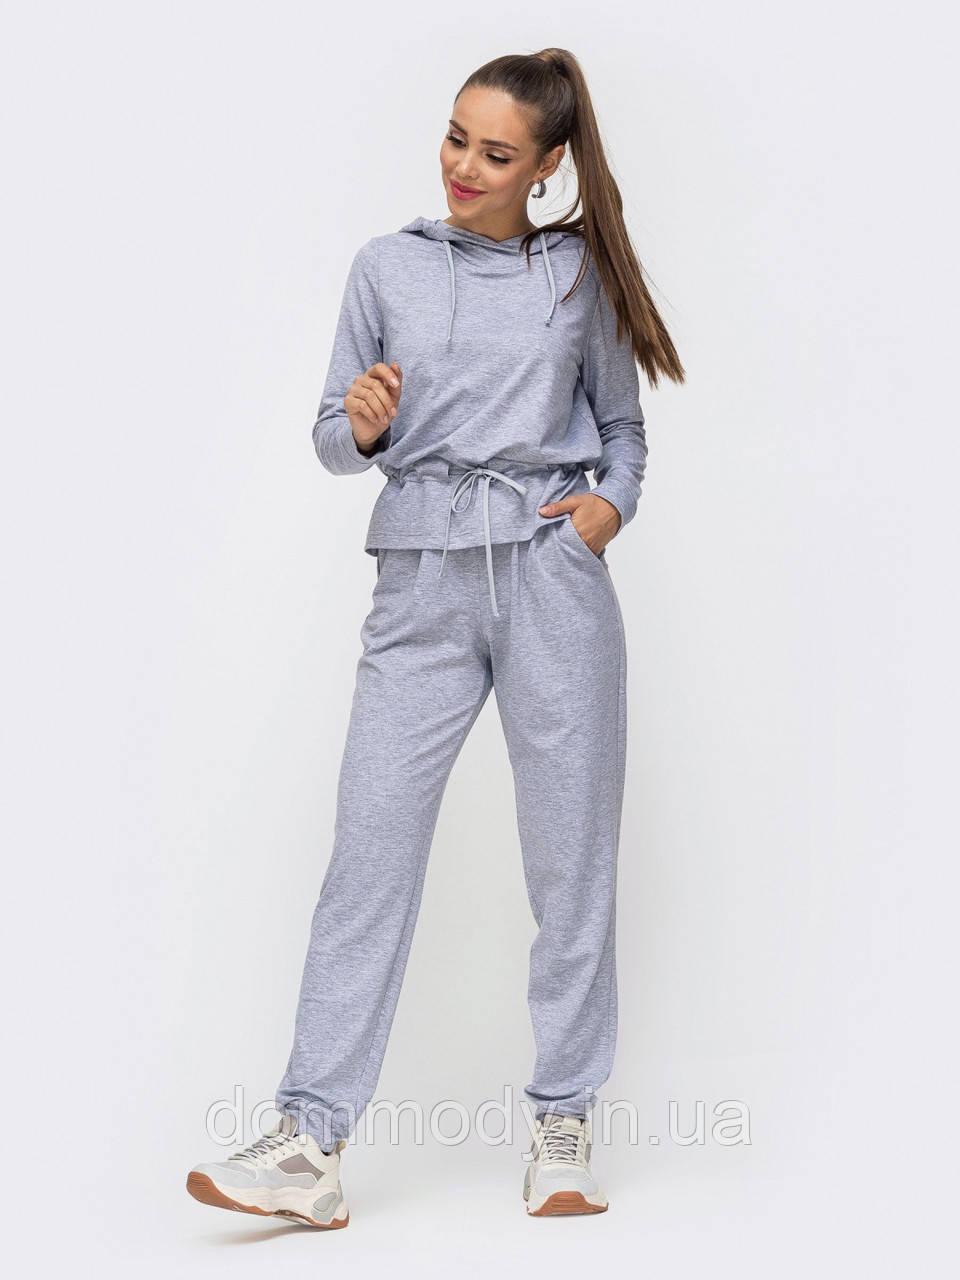 Костюм женский в стиле sport-casual gray